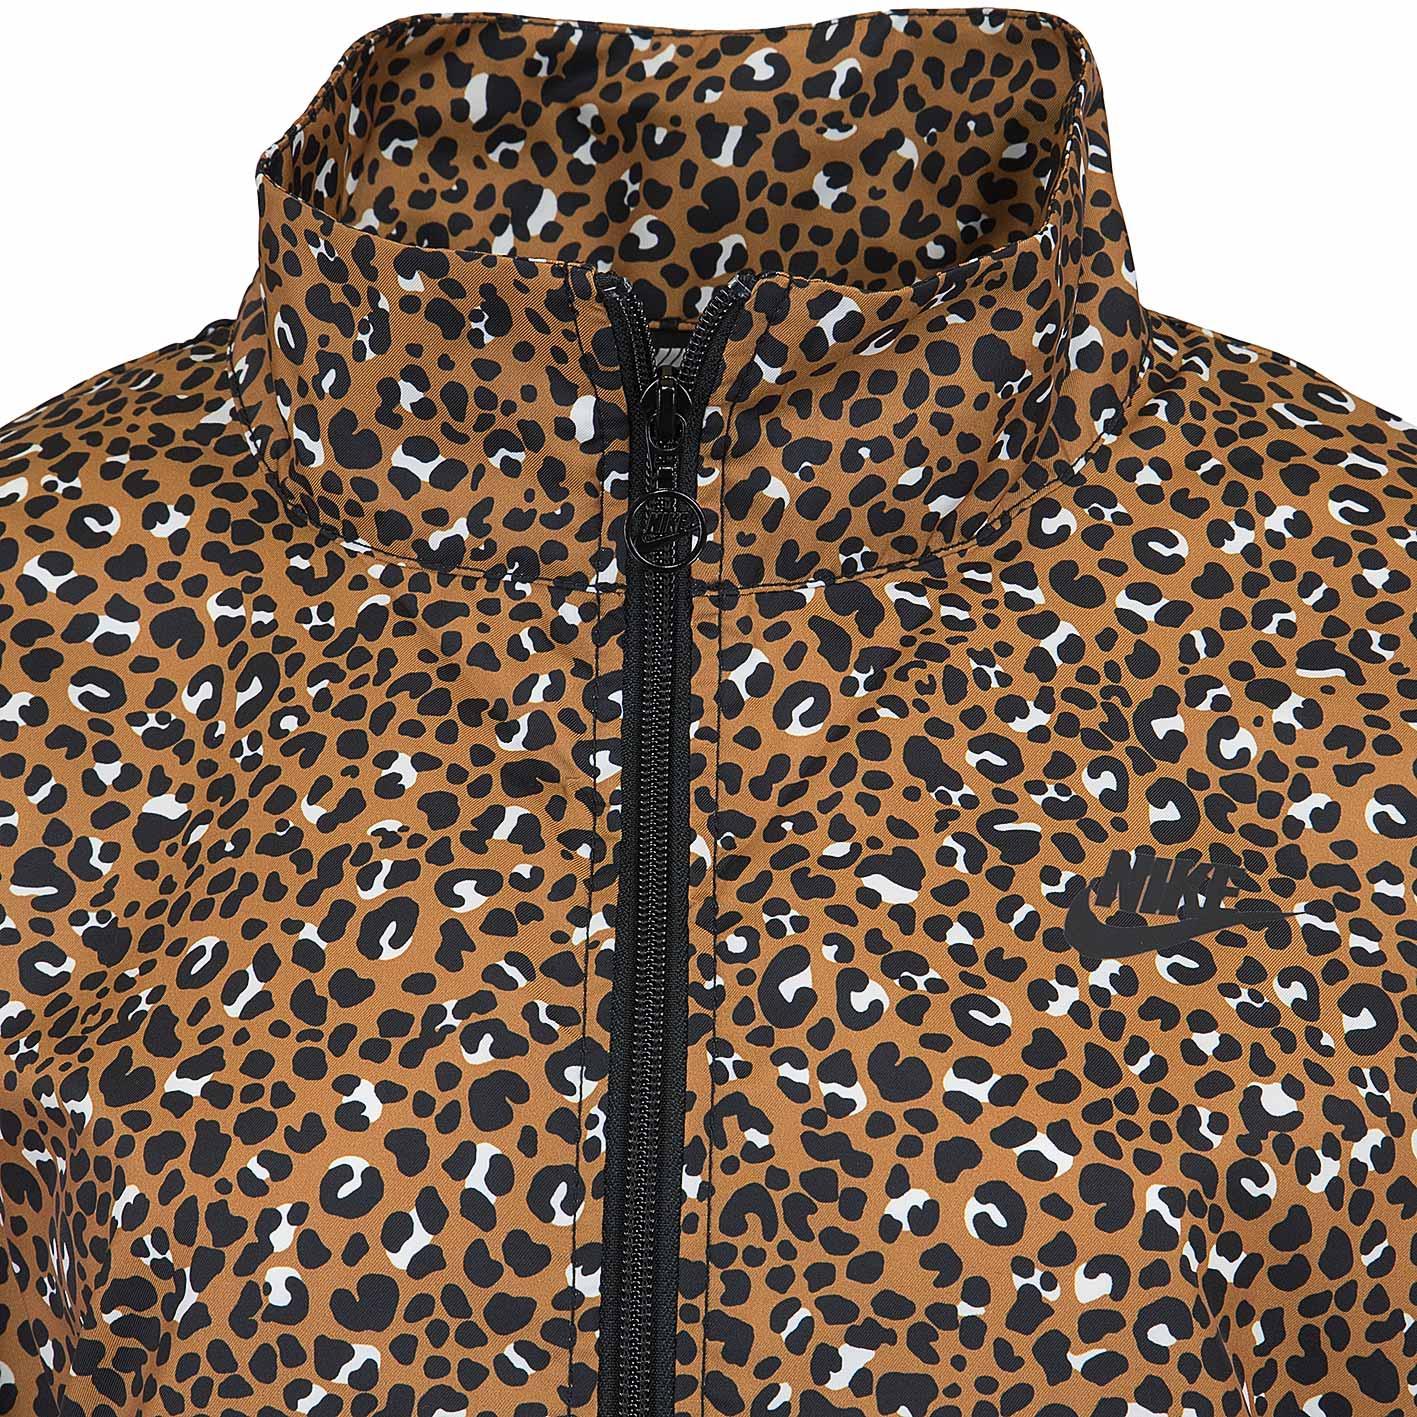 Nike Damen Trainingsjacke Jacke Animal Woven braunschwarz